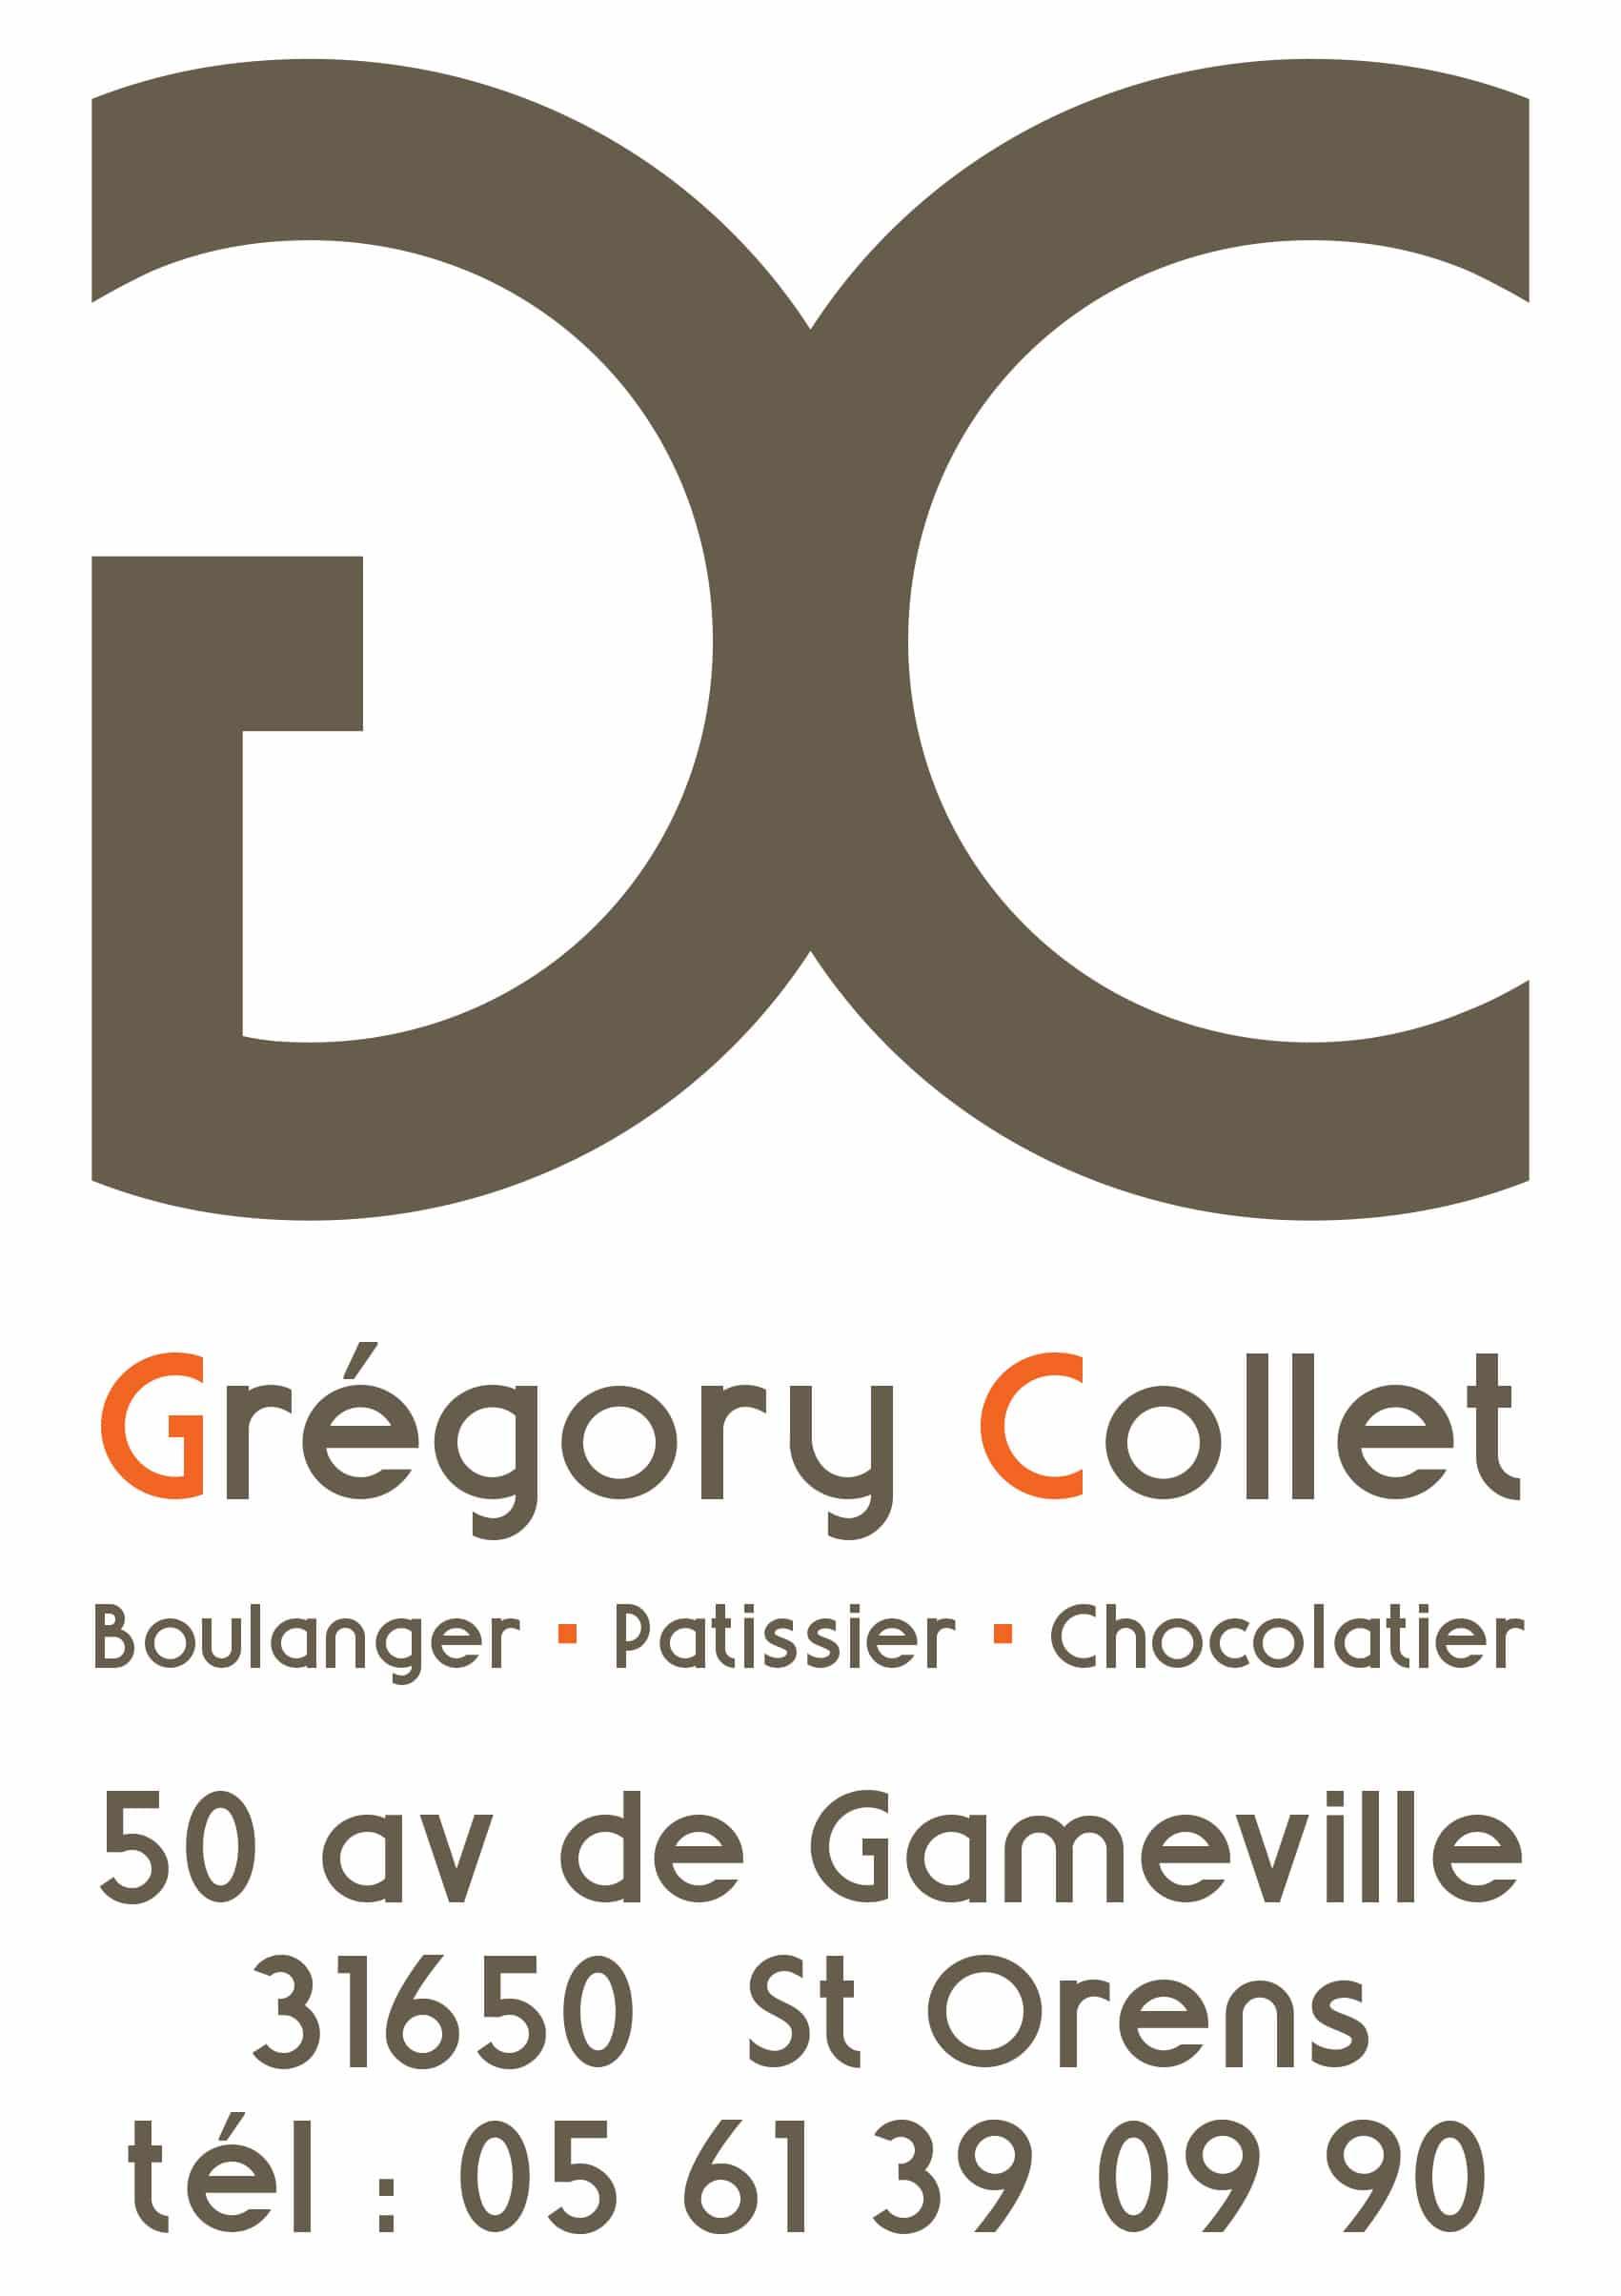 Boulangerie Grégory Collet